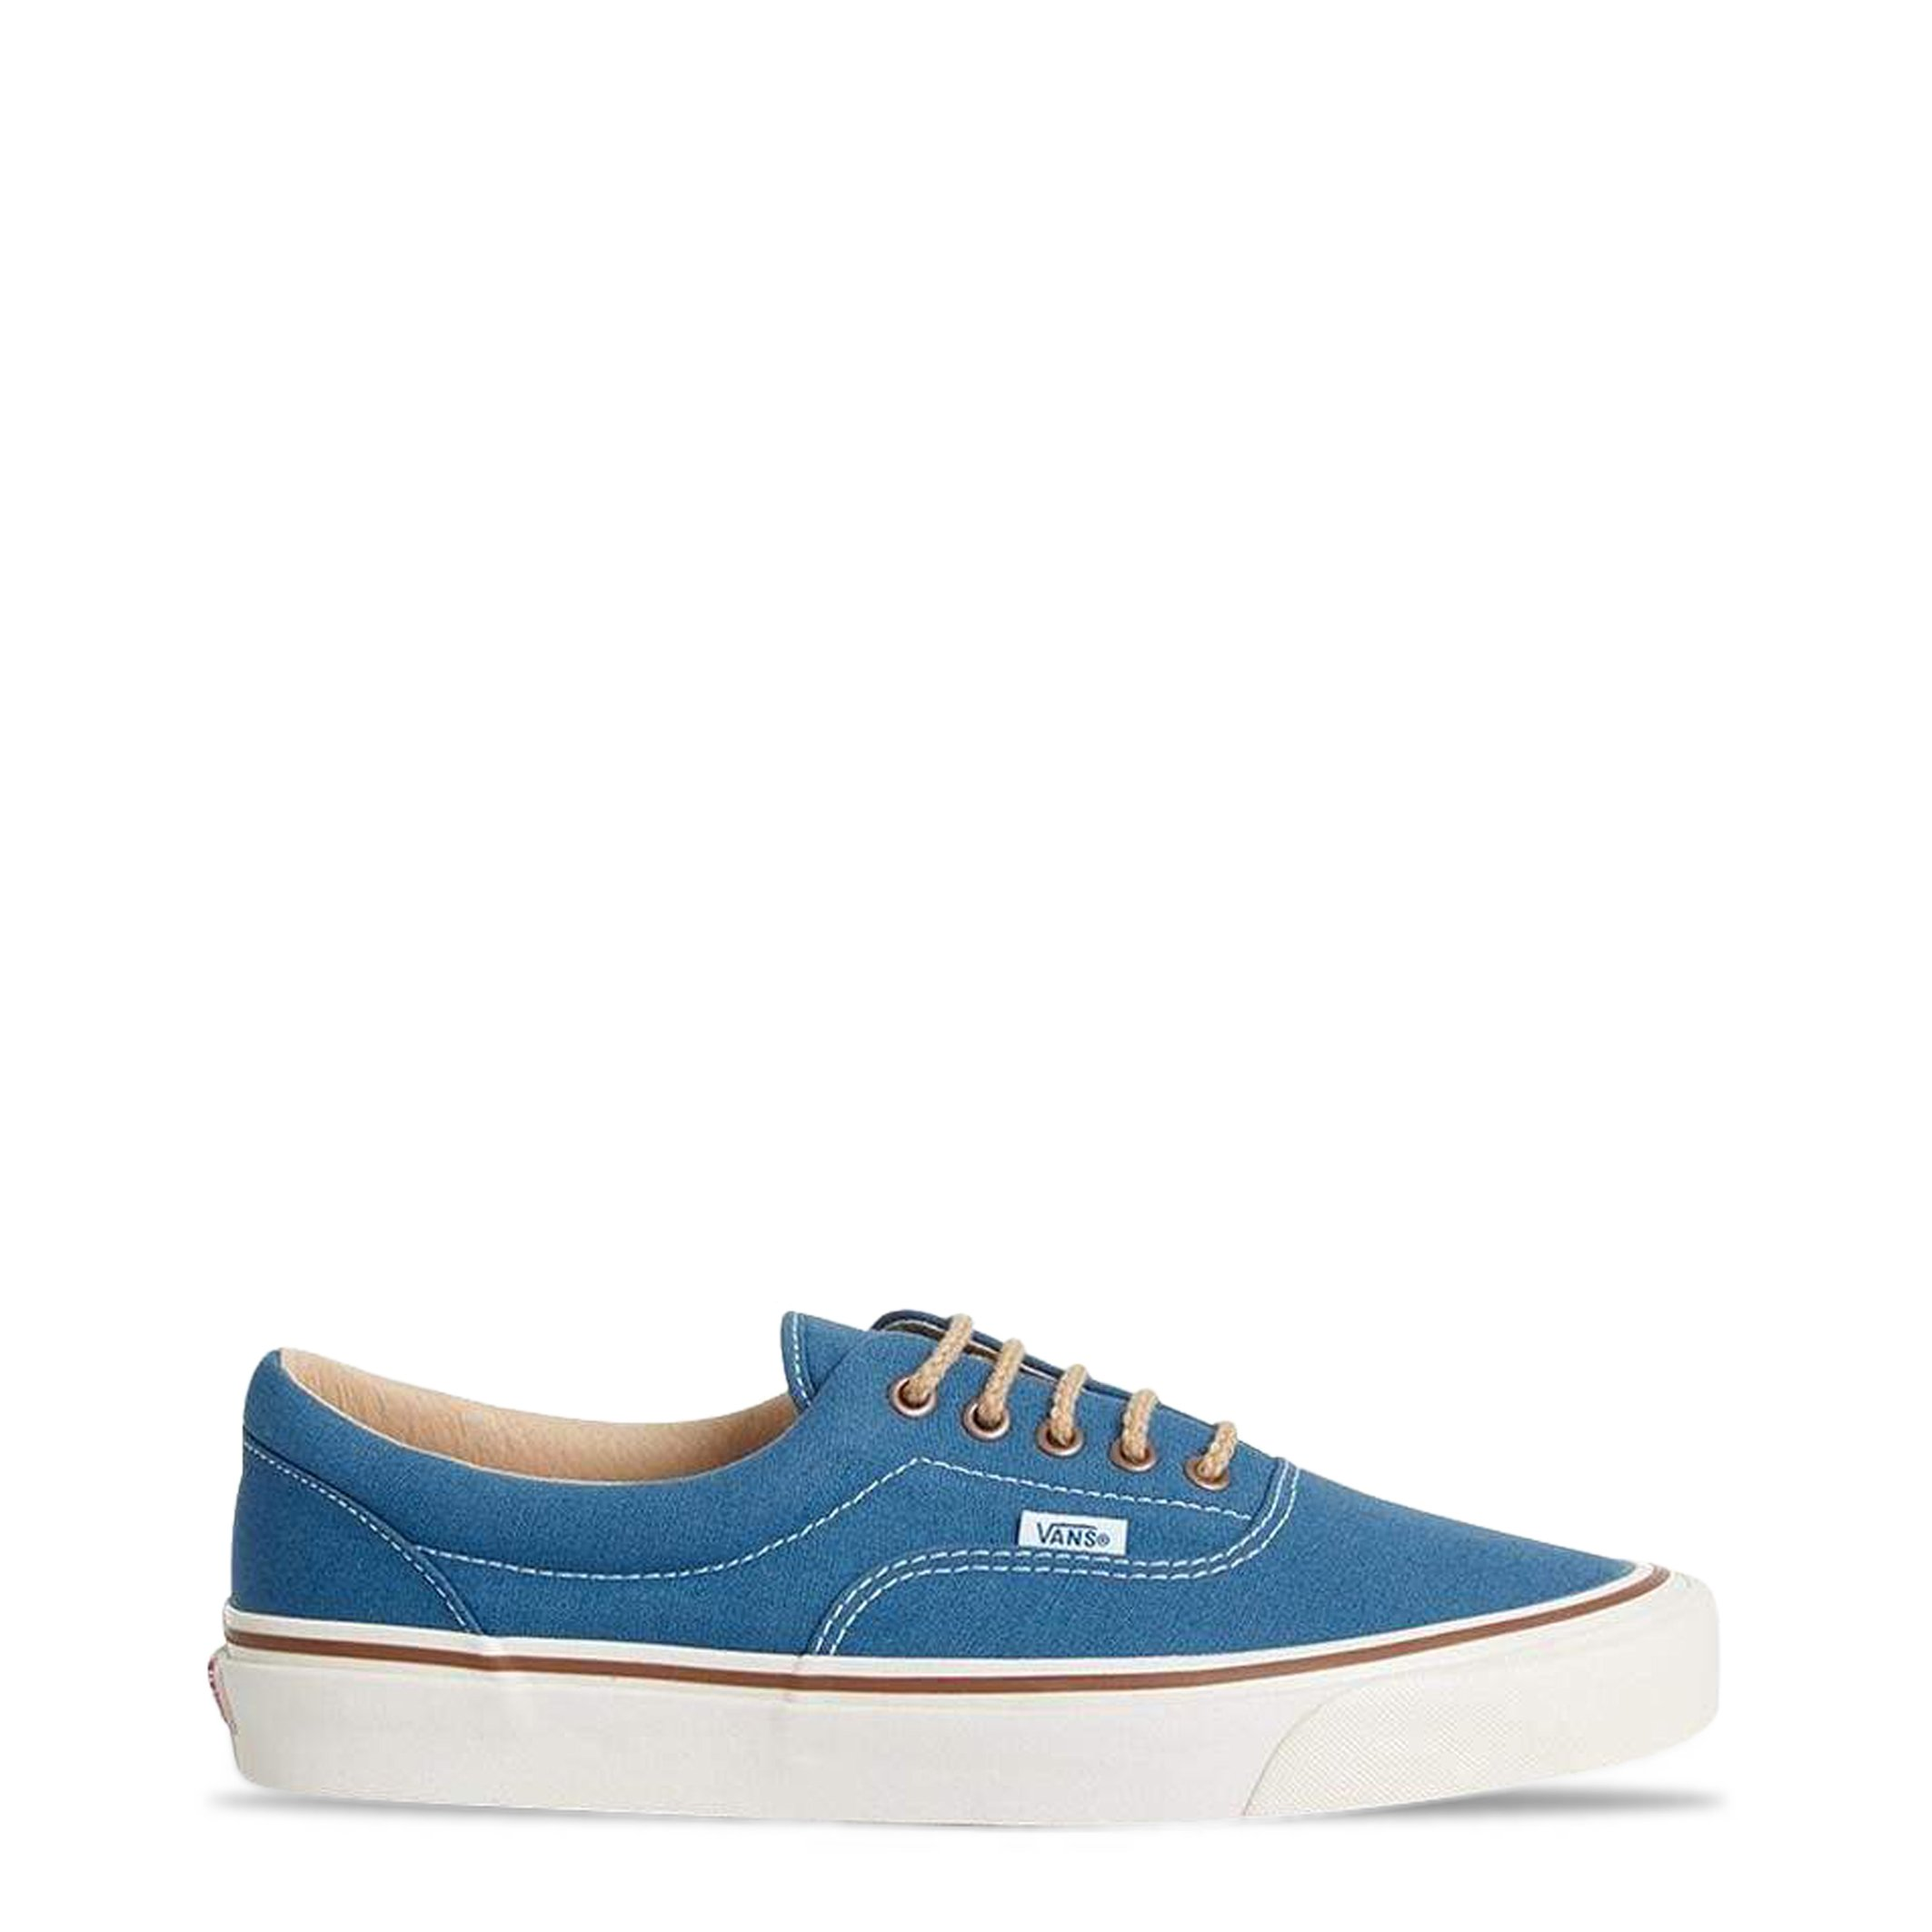 Vans Men's Trainers Red ERA-95_VN0A2RR1X7X1 - blue US 7.5